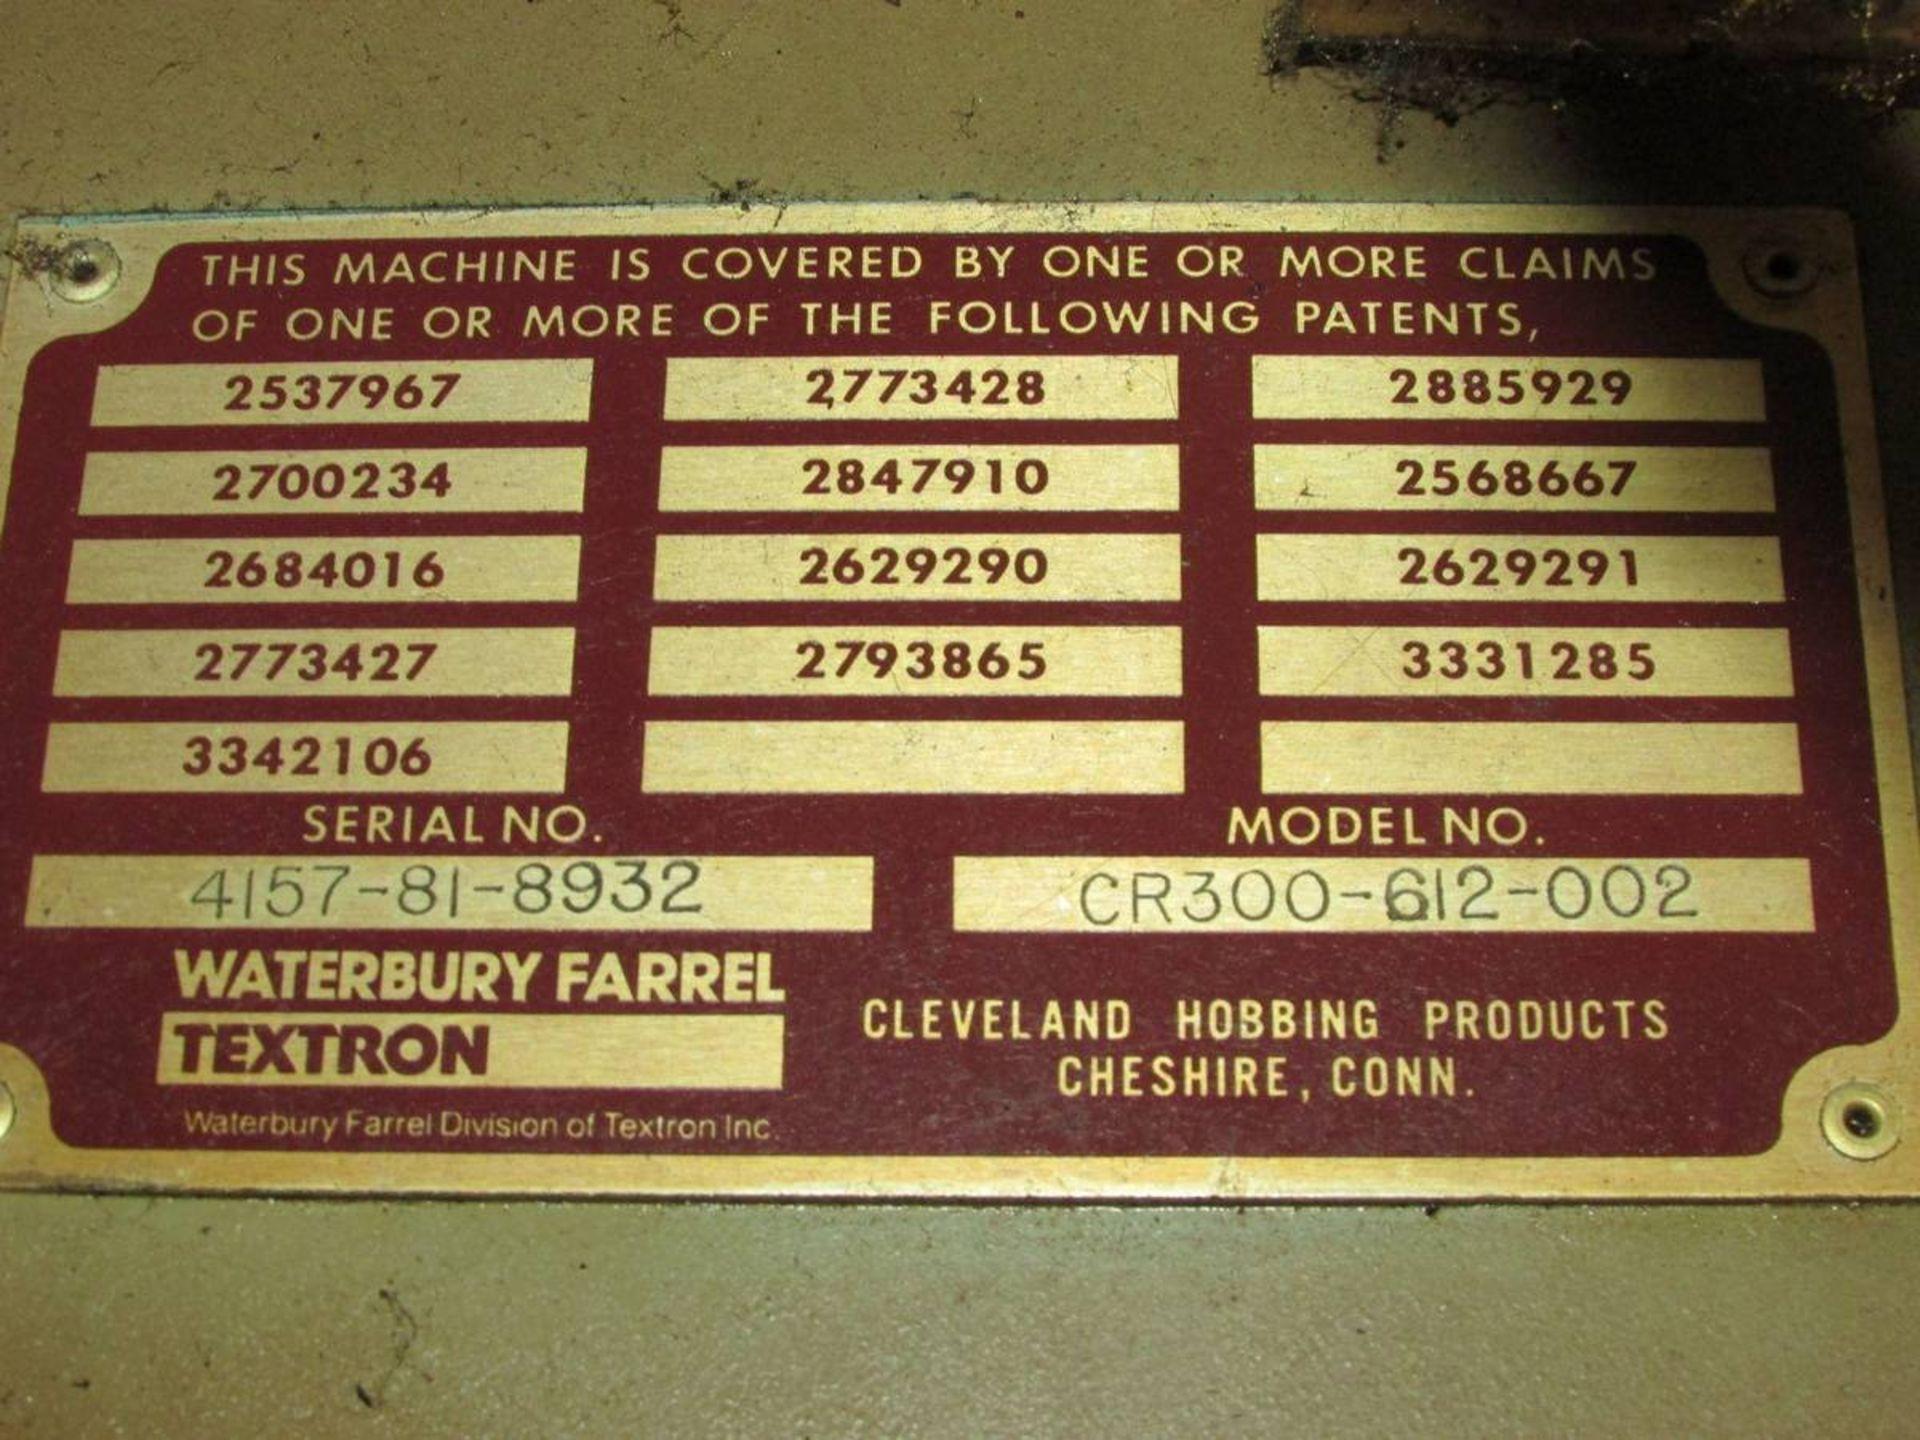 Cleveland/ Waterbury Farrel CR300-612-002 Universal CNC Gear Hobbing Machine - Image 19 of 19